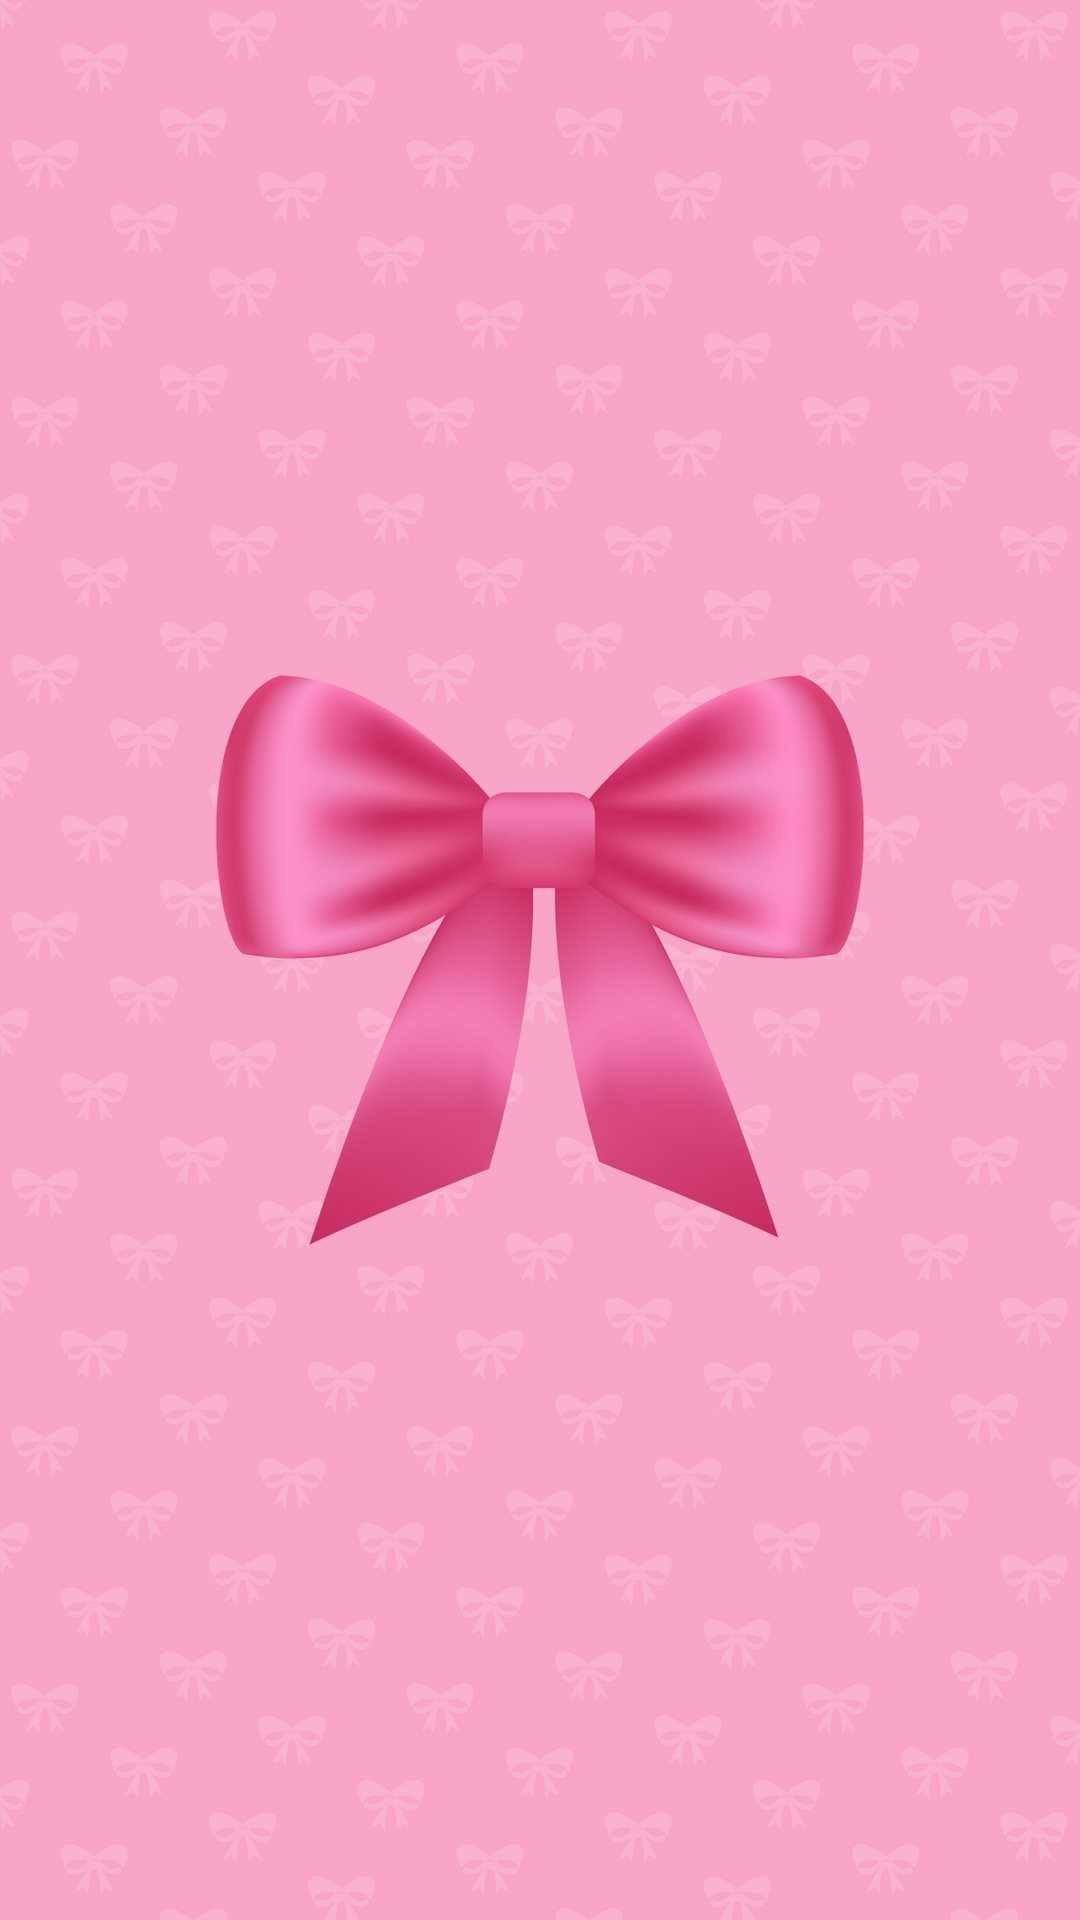 Pink Ribbon Wallpaper 44 Images